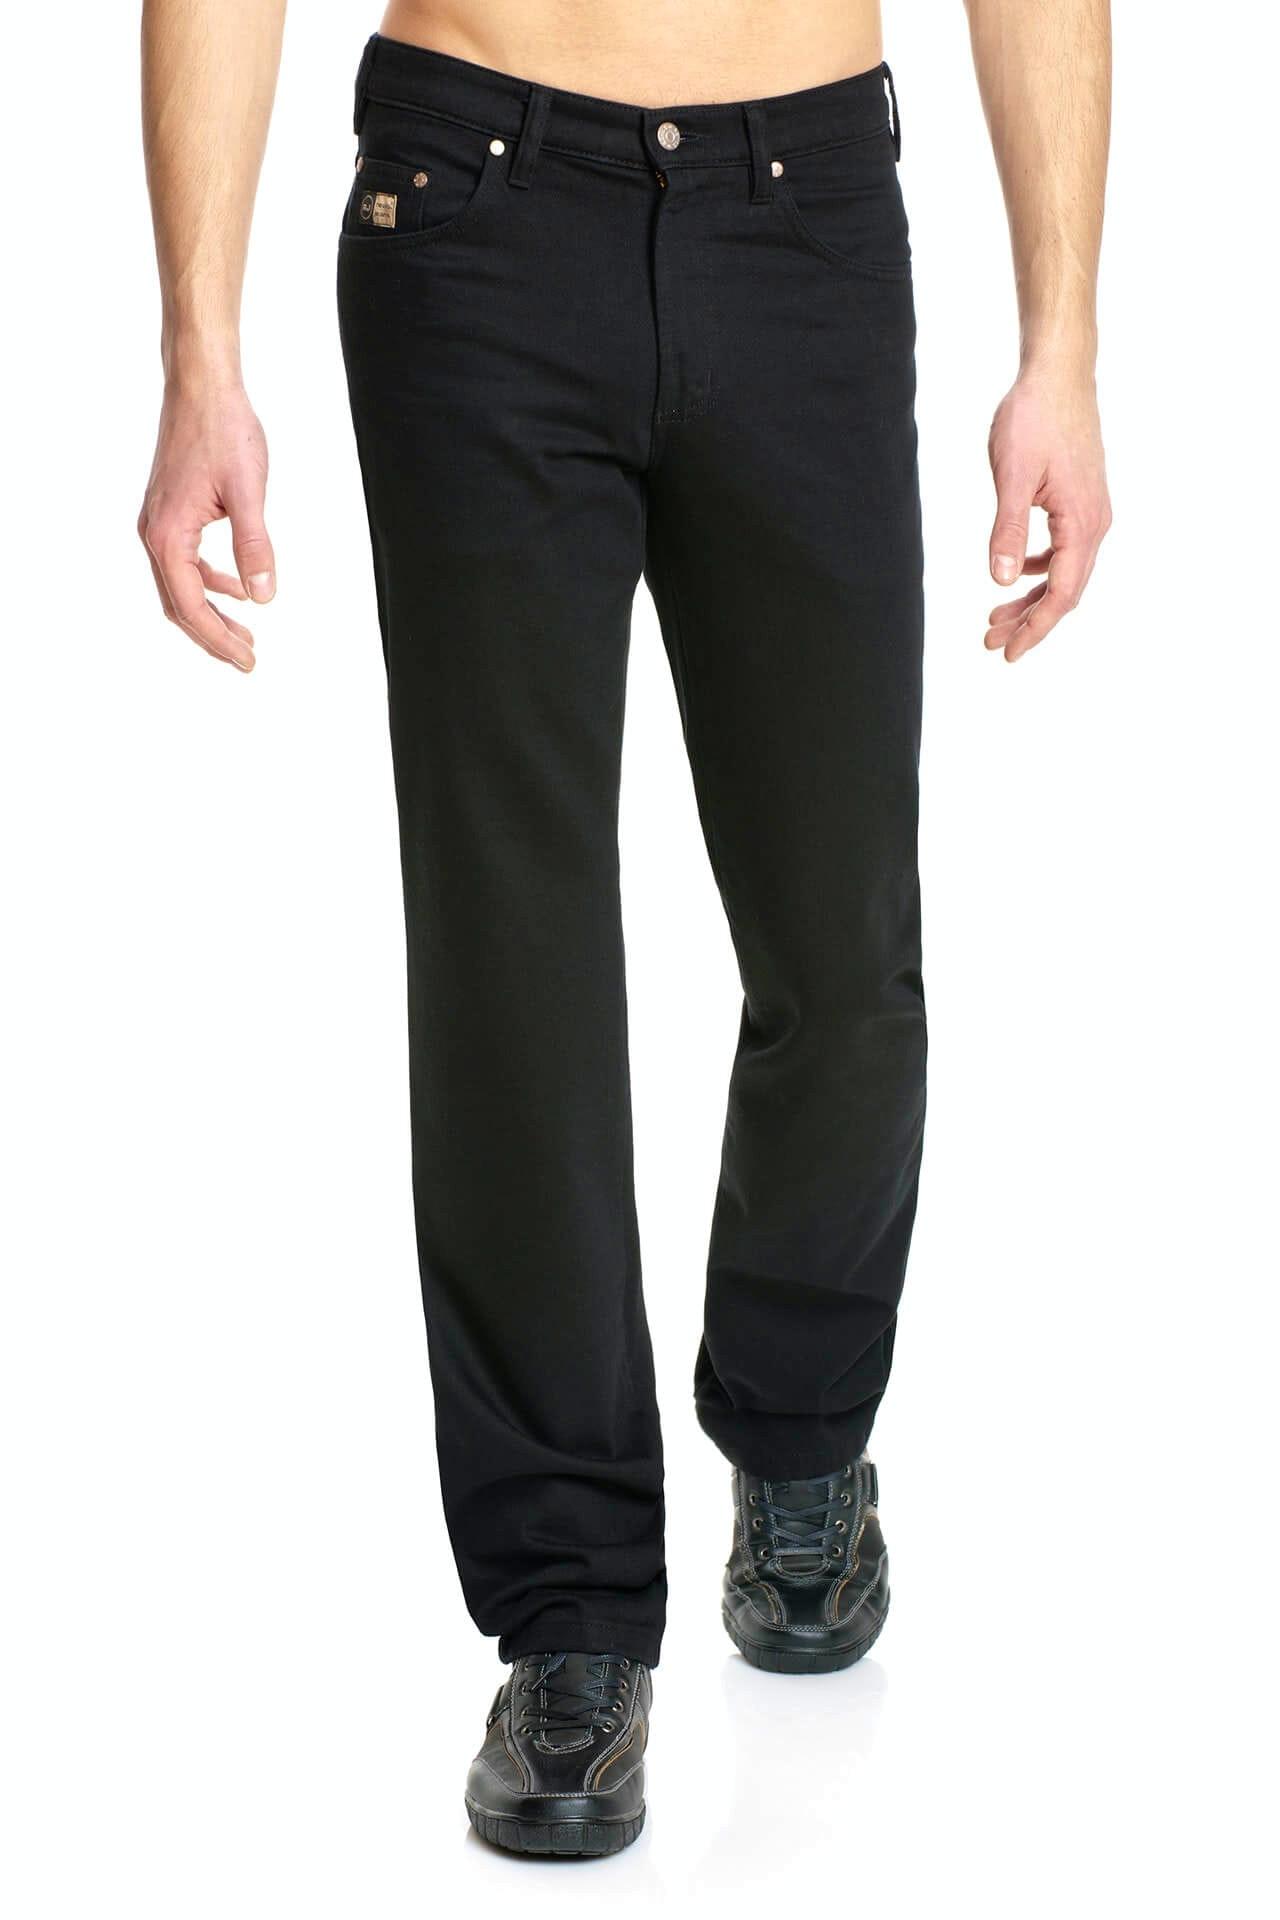 Revils Jeans 302 black Stretch